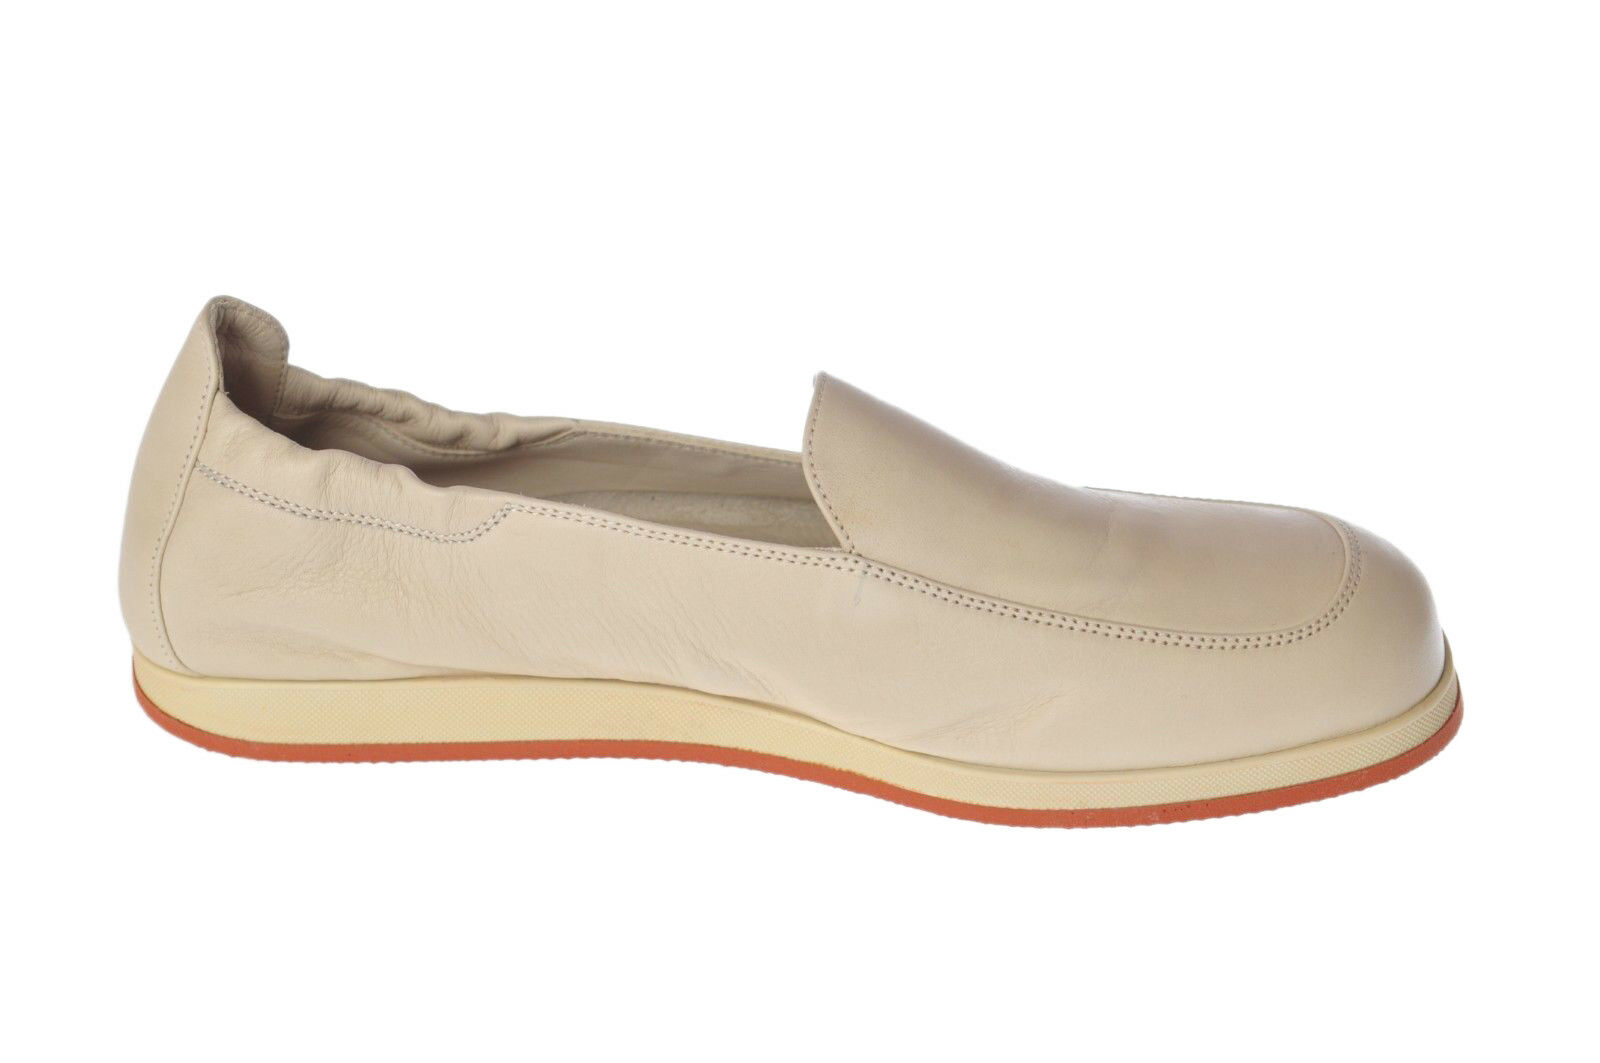 Barleycorn - scarpe-Moccasins - Woman - bianca - 5142720C184125